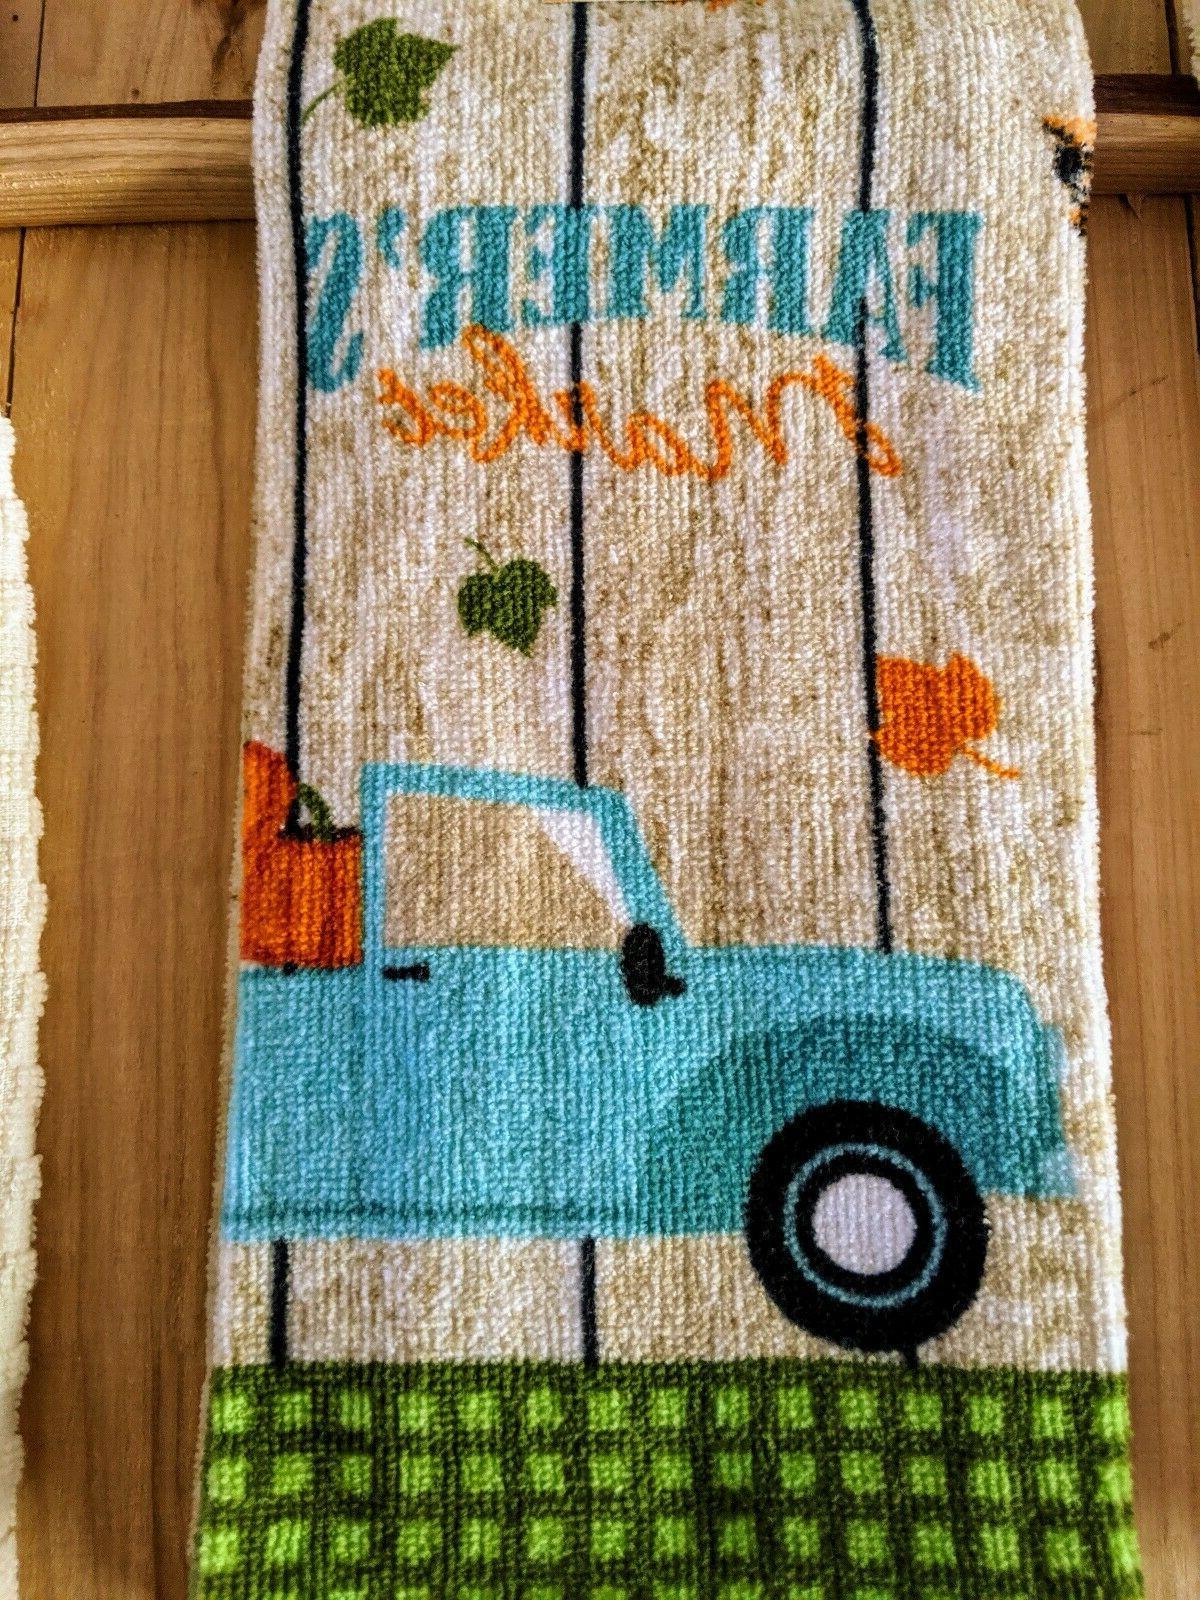 Farmers Market Dishtowel Set 4 Pc Potholder Fall Pumpkin Truck